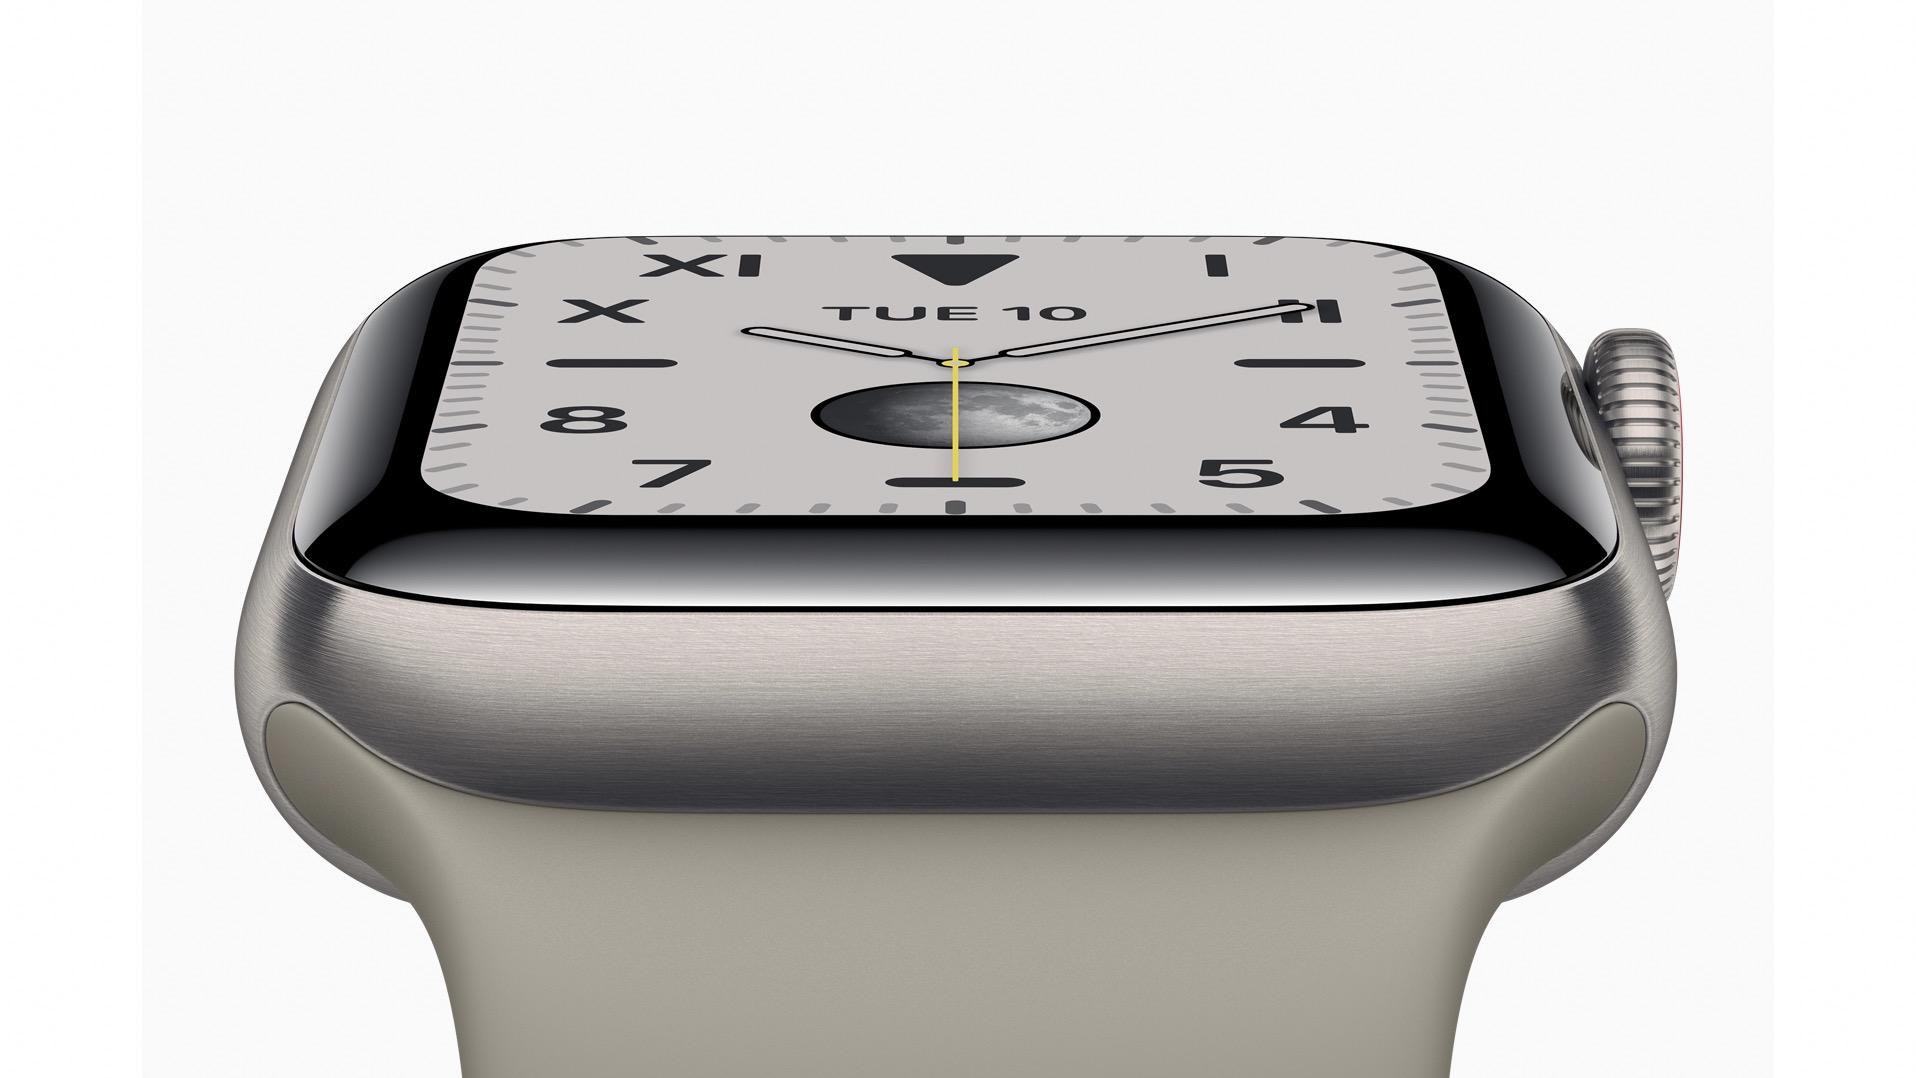 Apple Watch Series 5 in aluminum